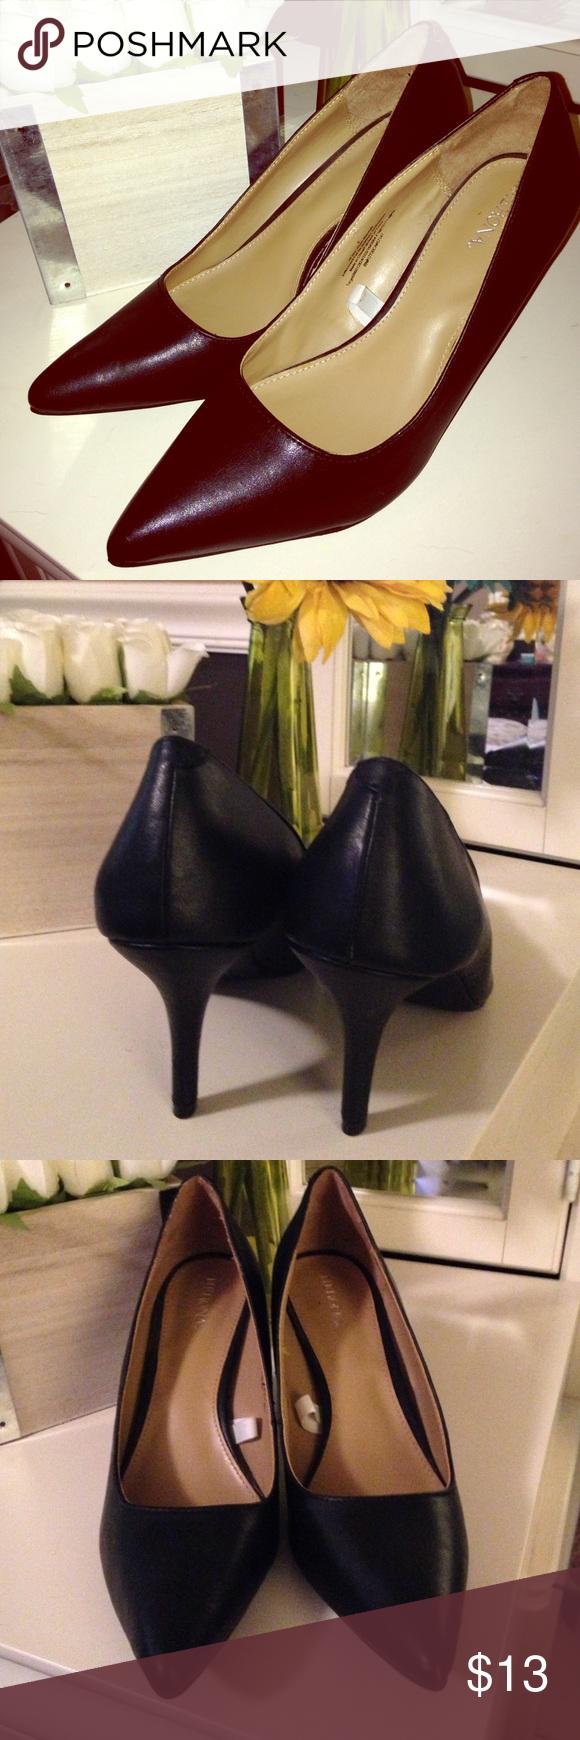 Merona kitten heels size 9! Perfect condition ! Merona kitten heels size 9! Perfect condition !  All black ! Merona Shoes Heels